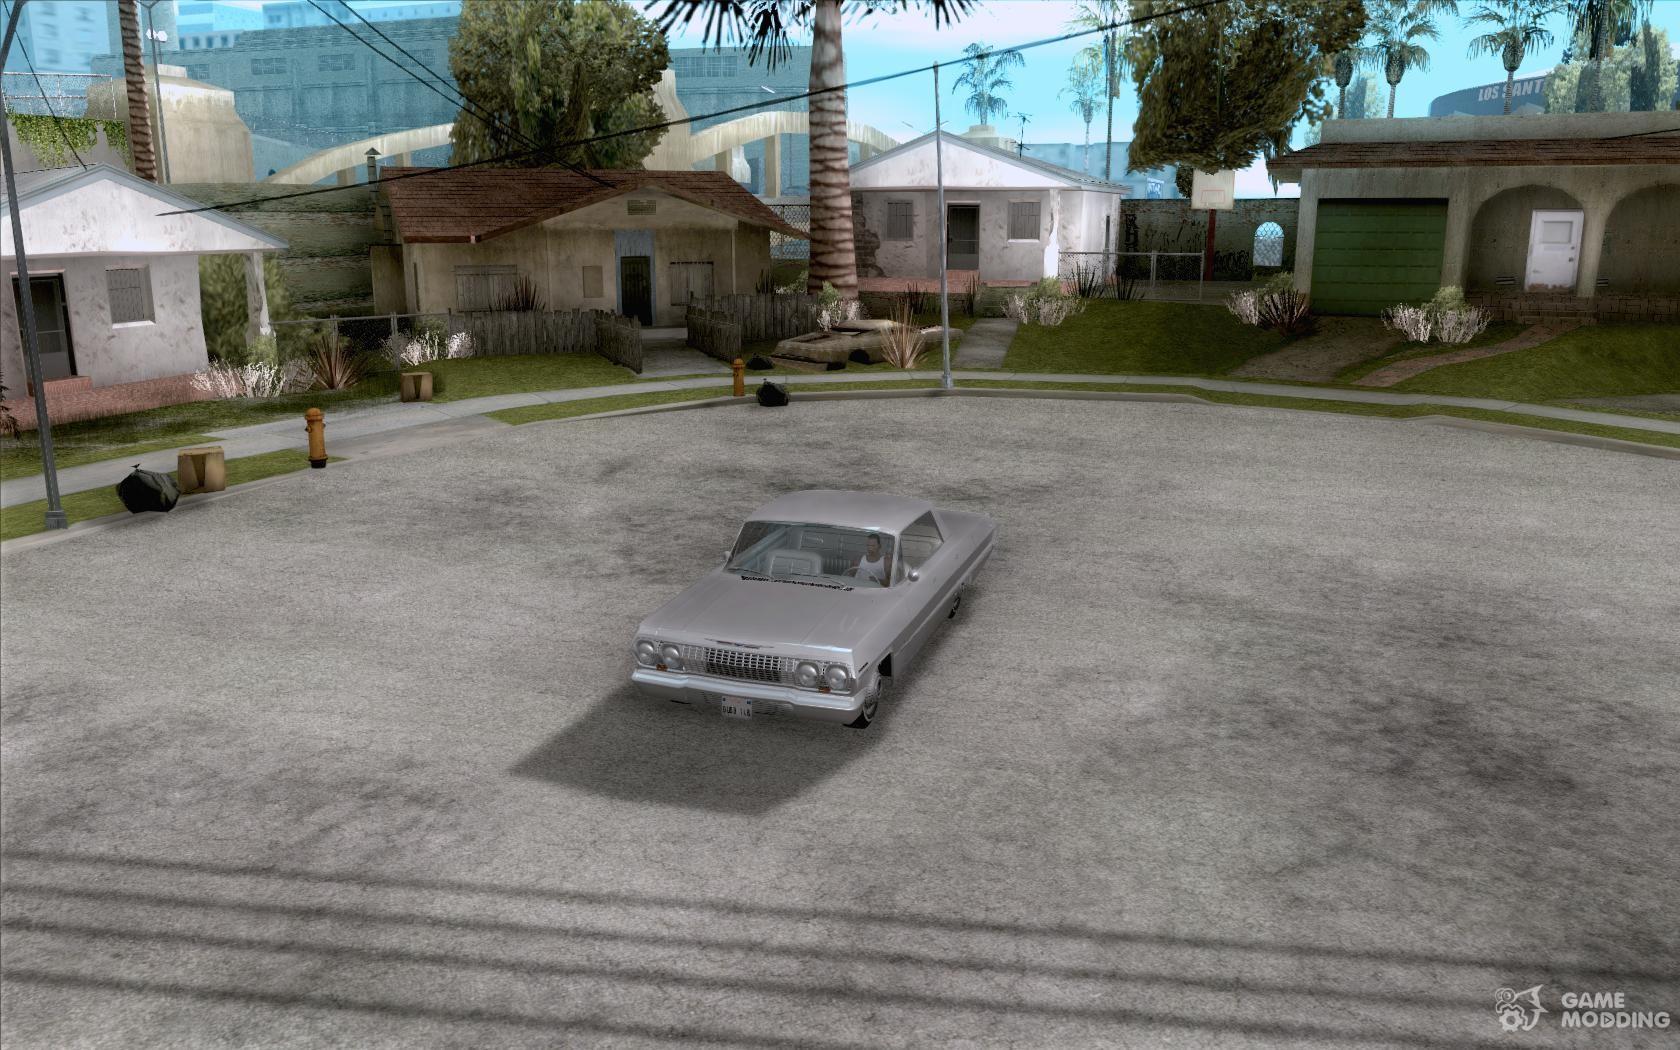 Chevrolet impala 4 door hardtop 1963 for gta san andreas - Chevrolet Impala 4 Door Hardtop 1963 For Gta San Andreas